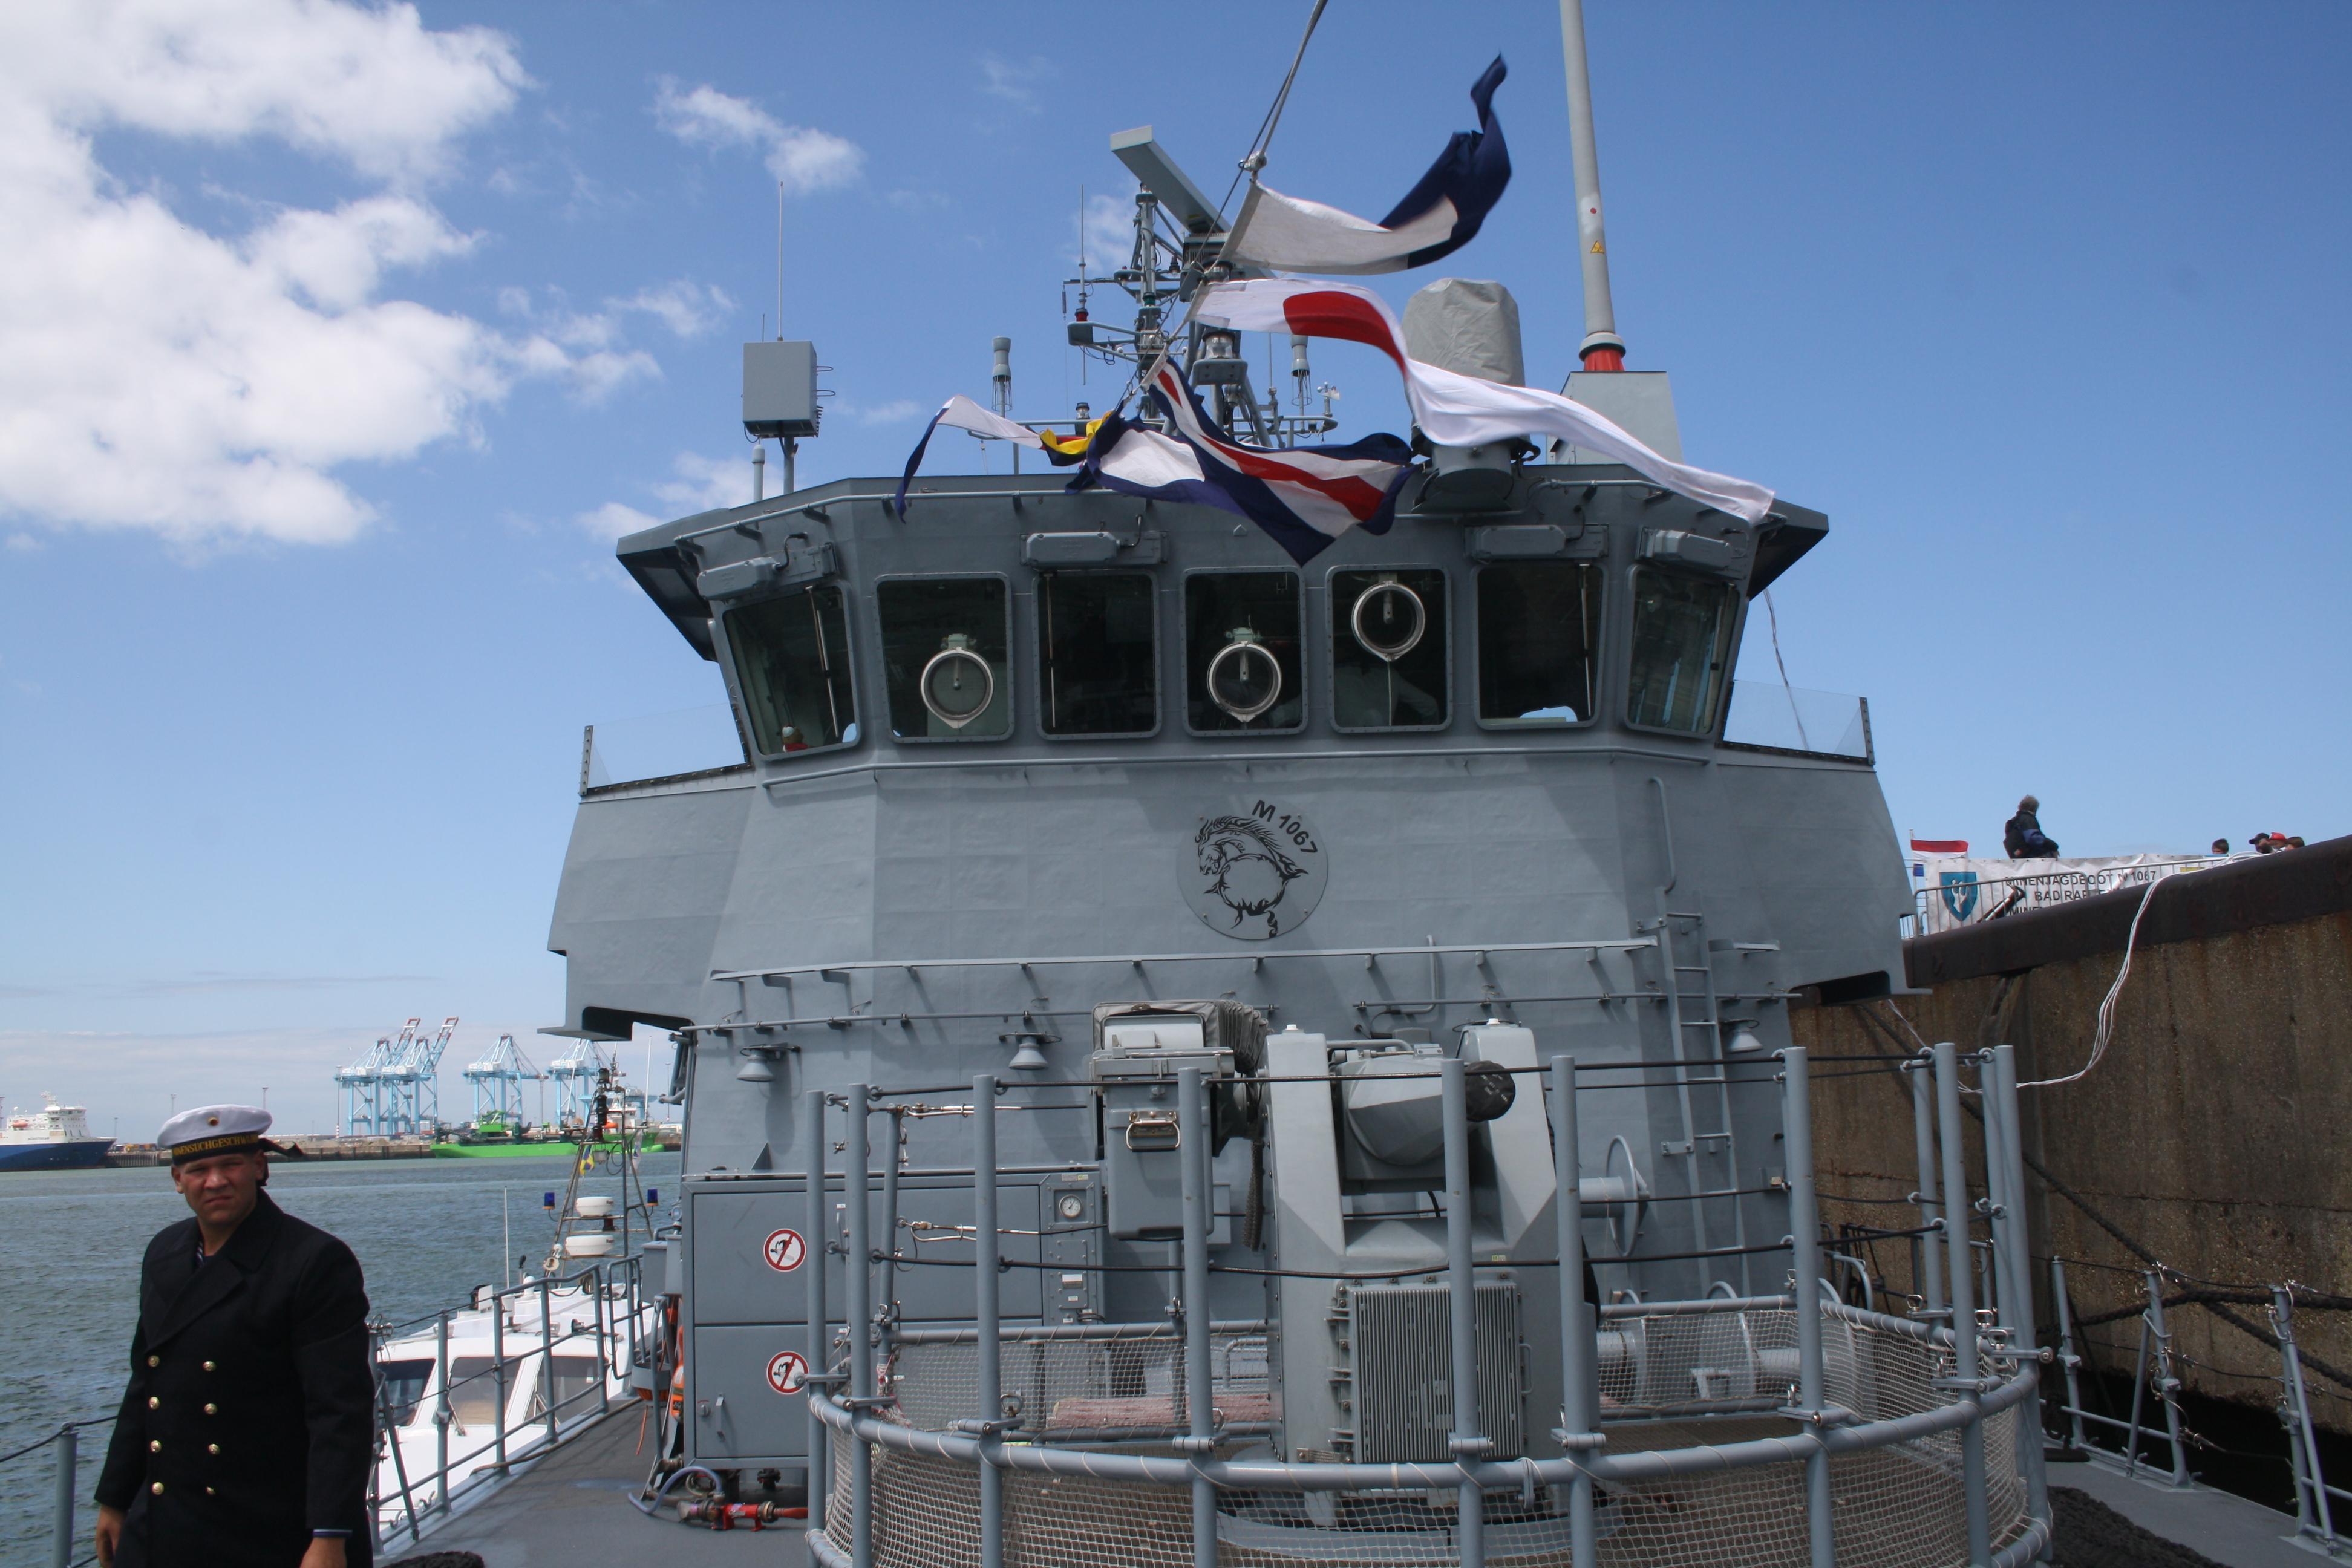 Portes ouvertes 2011 - Navy Days Zeebrugge 2011   - Page 5 1107110710021095838456650